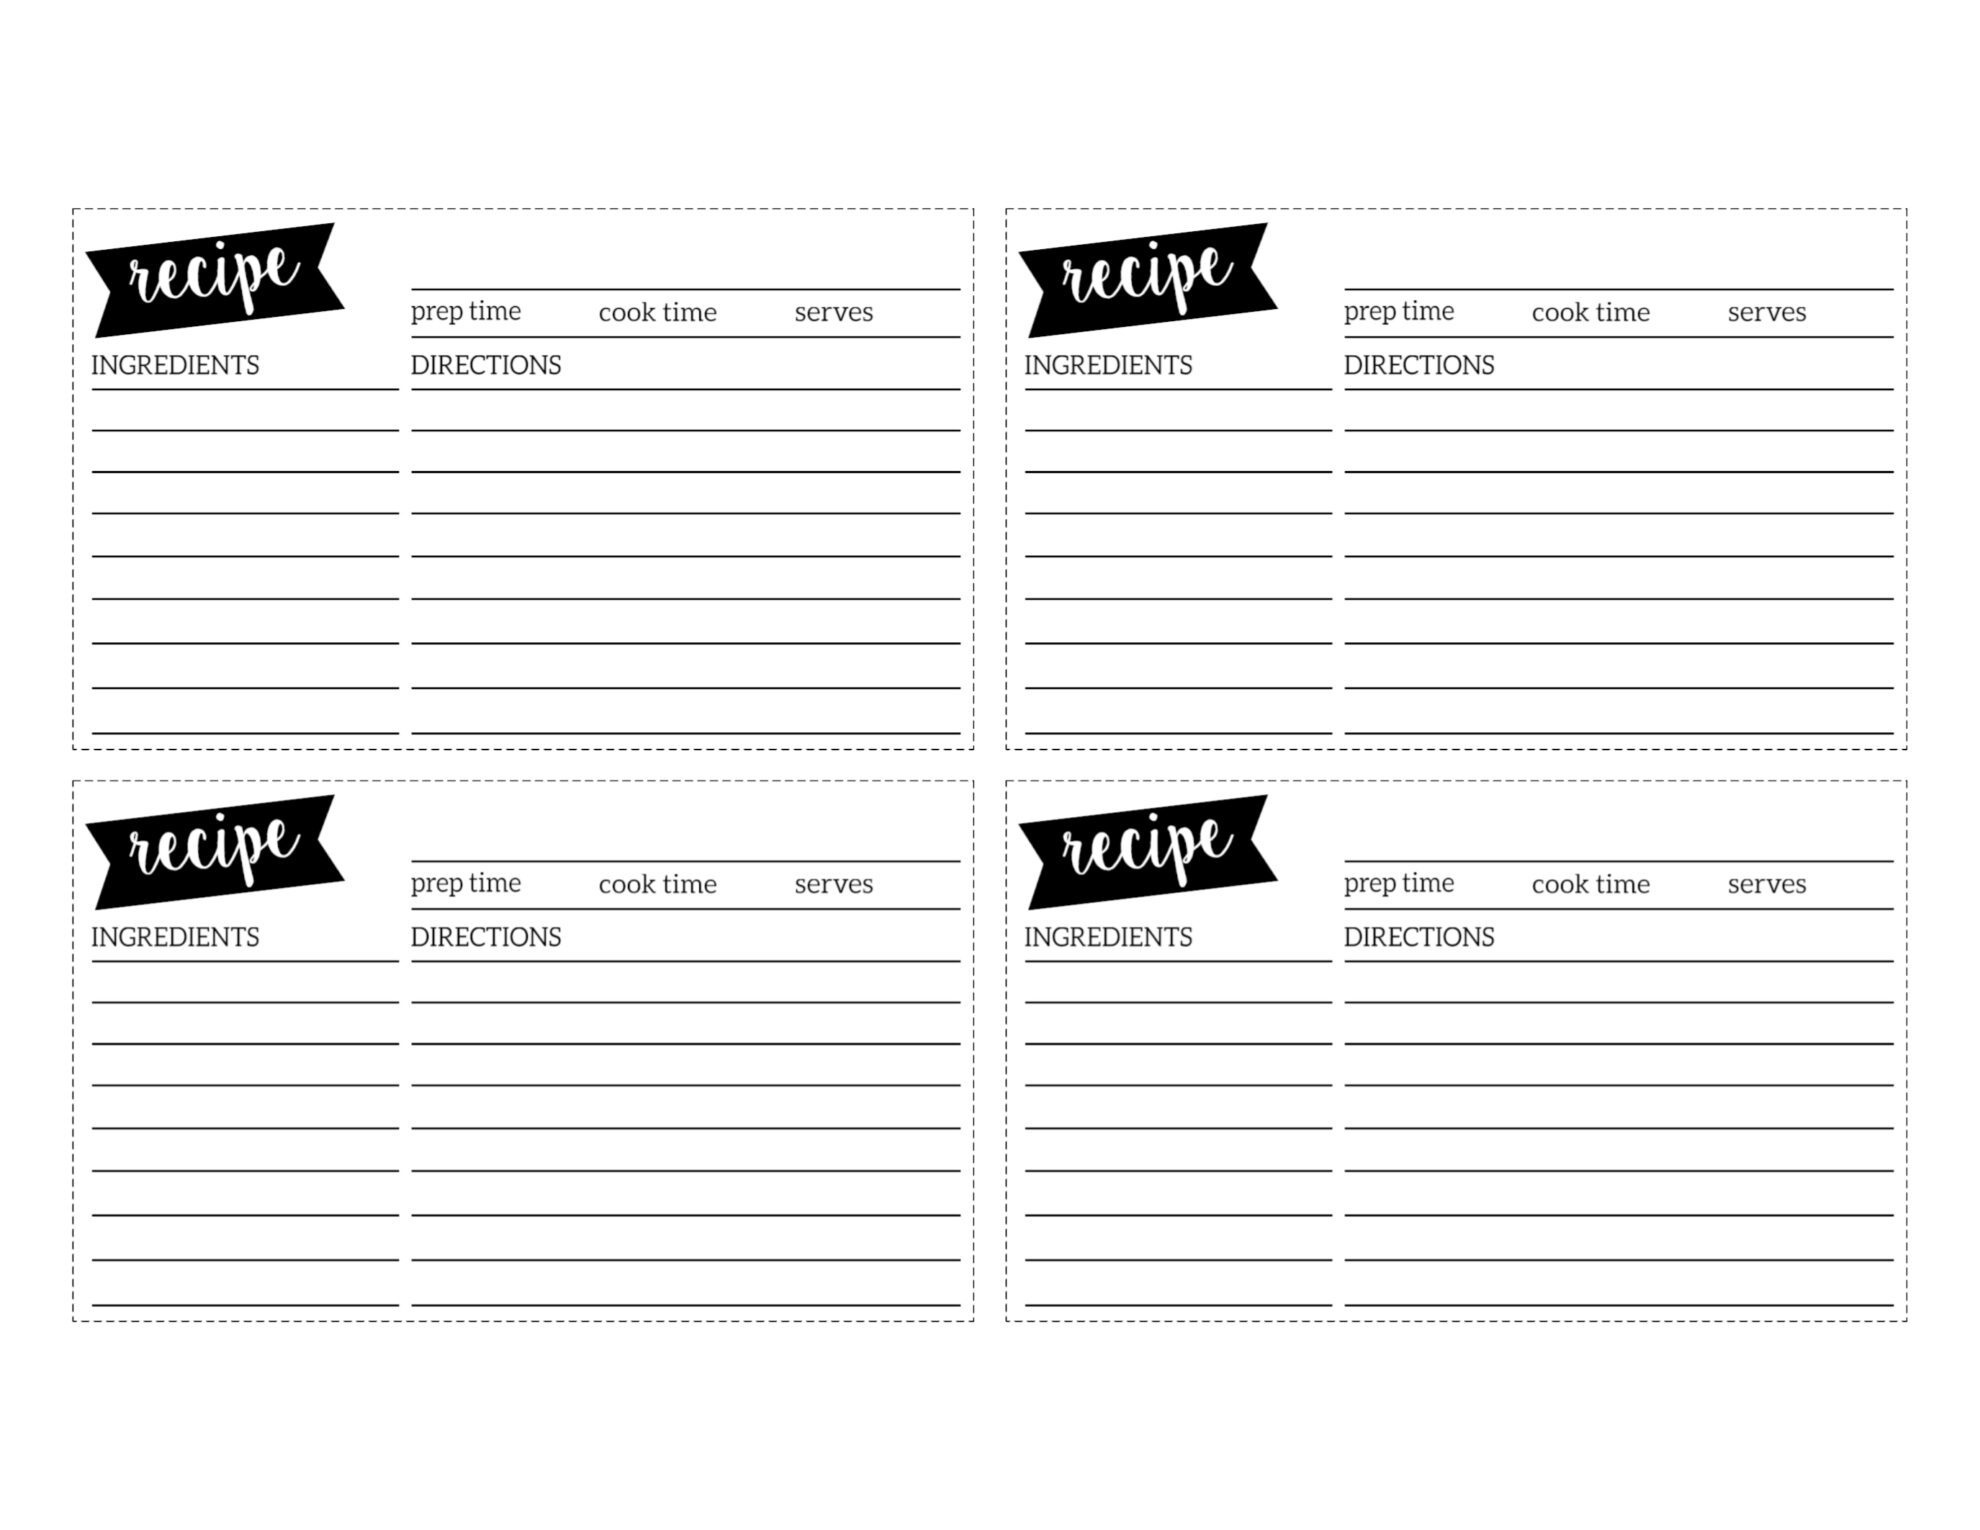 Free Recipe Card Template Printable - Paper Trail Design - Free Printable Recipe Templates